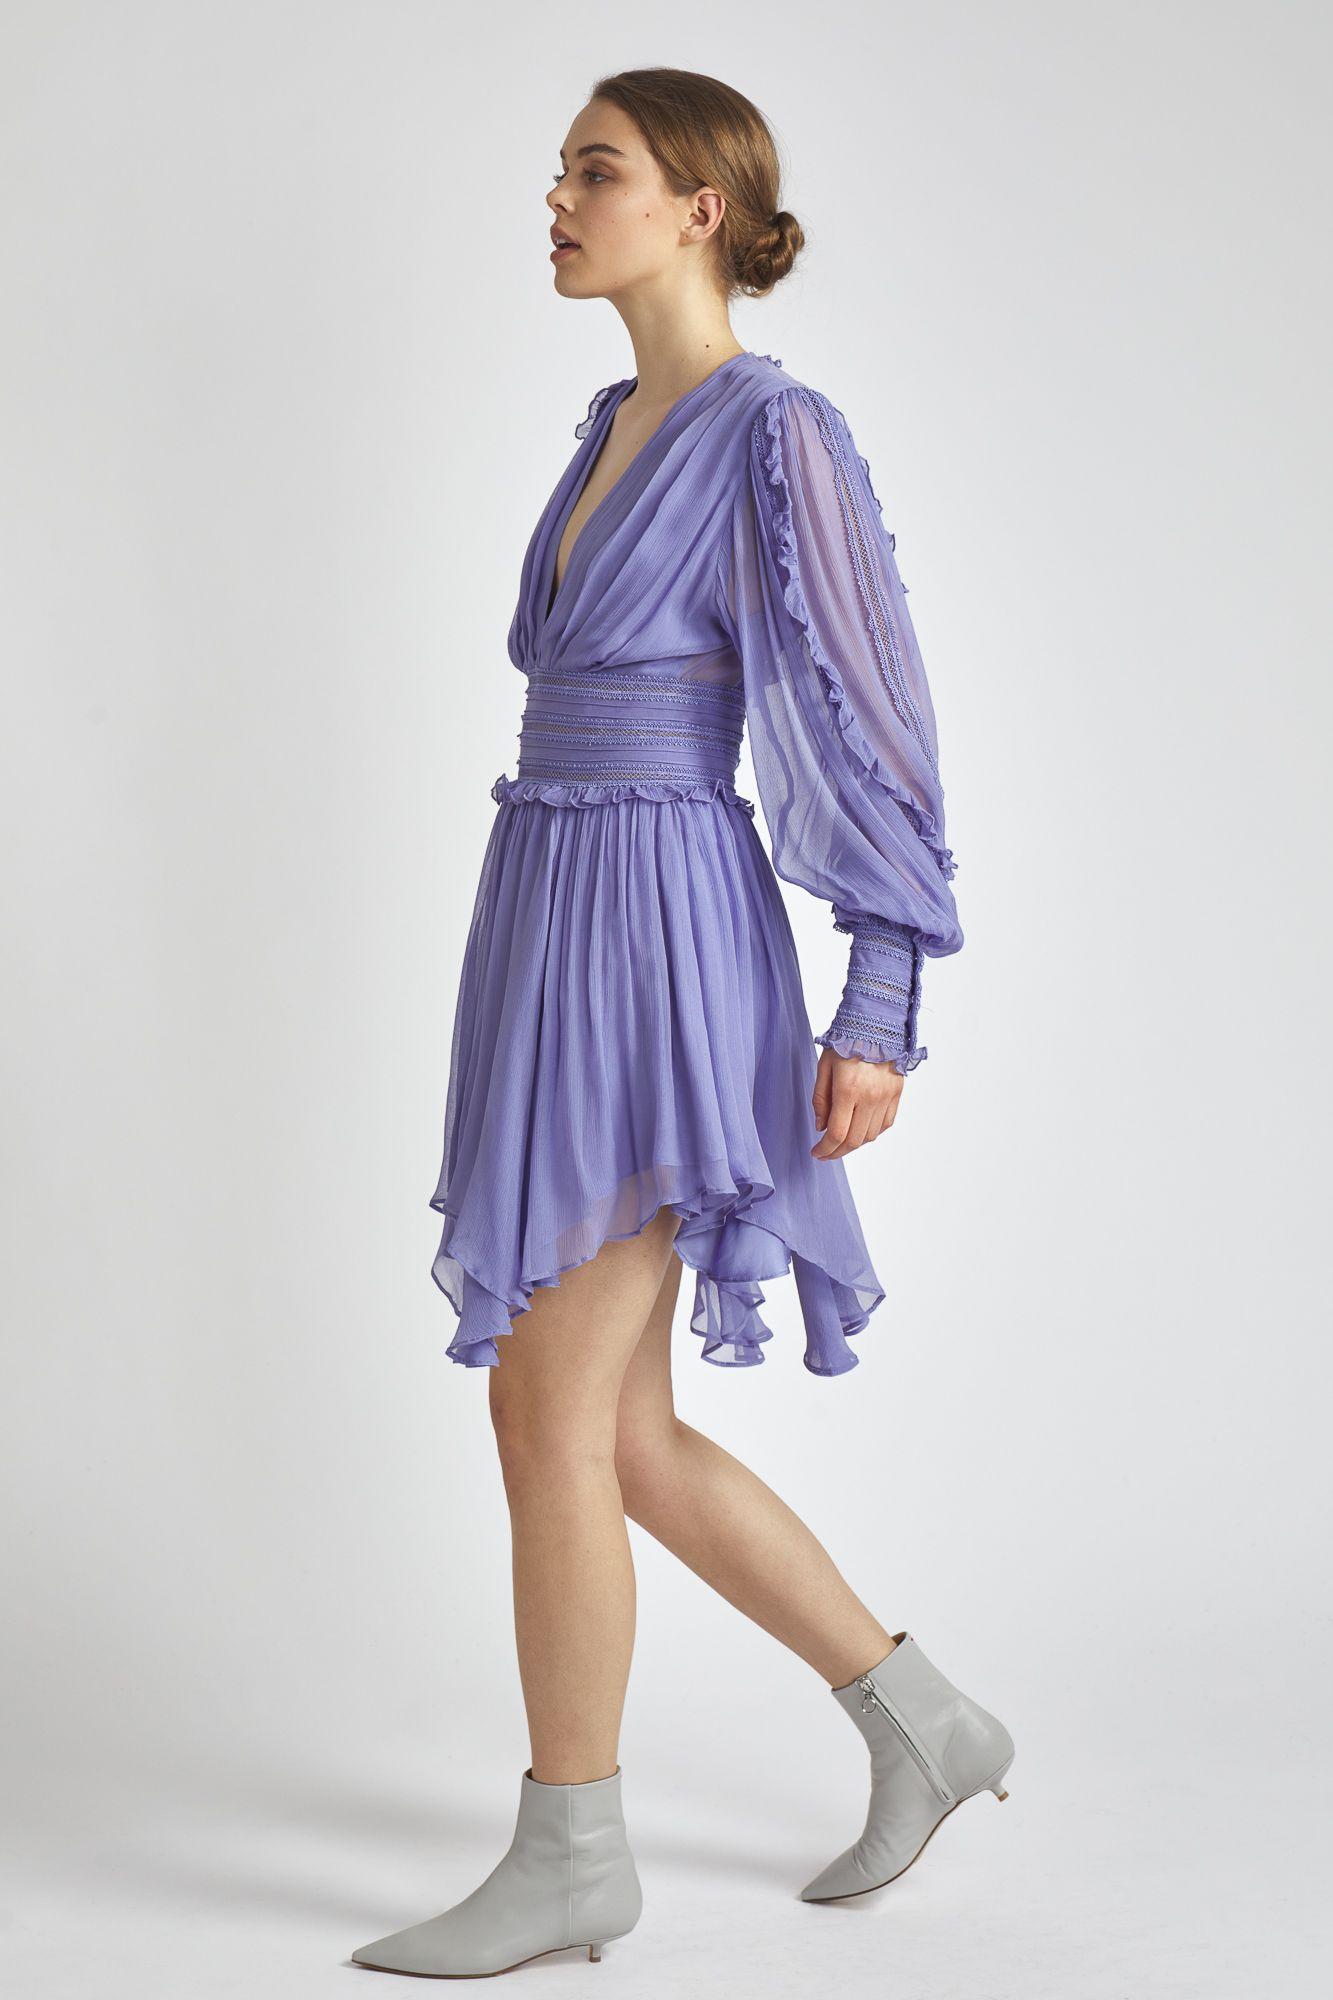 Eve dress, Magali Pascal, Boho Kleid, Summer 2021